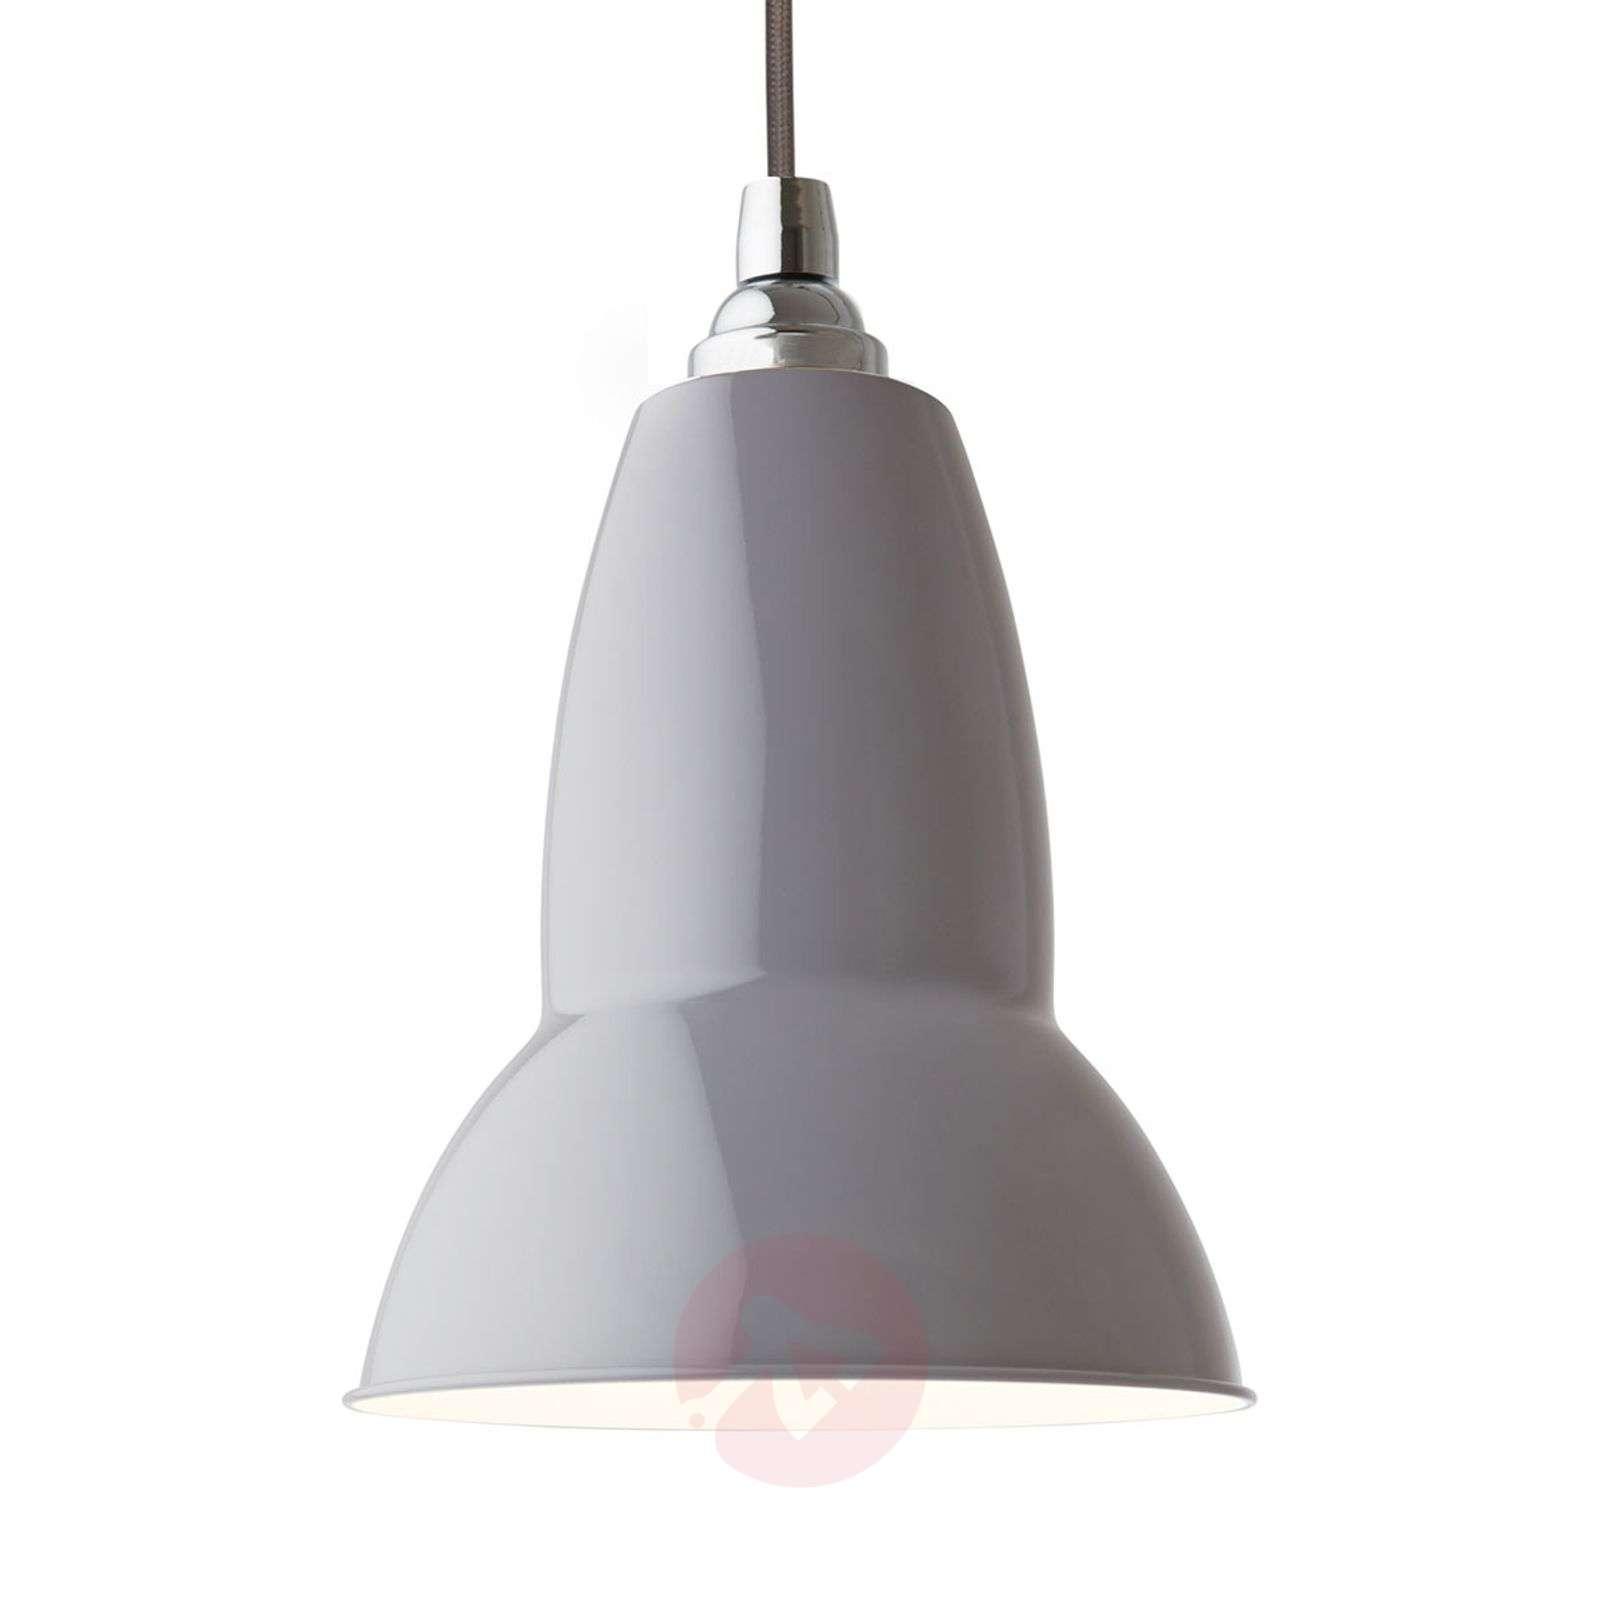 Anglepoise Original 1227 hanging lamp-1073079X-01